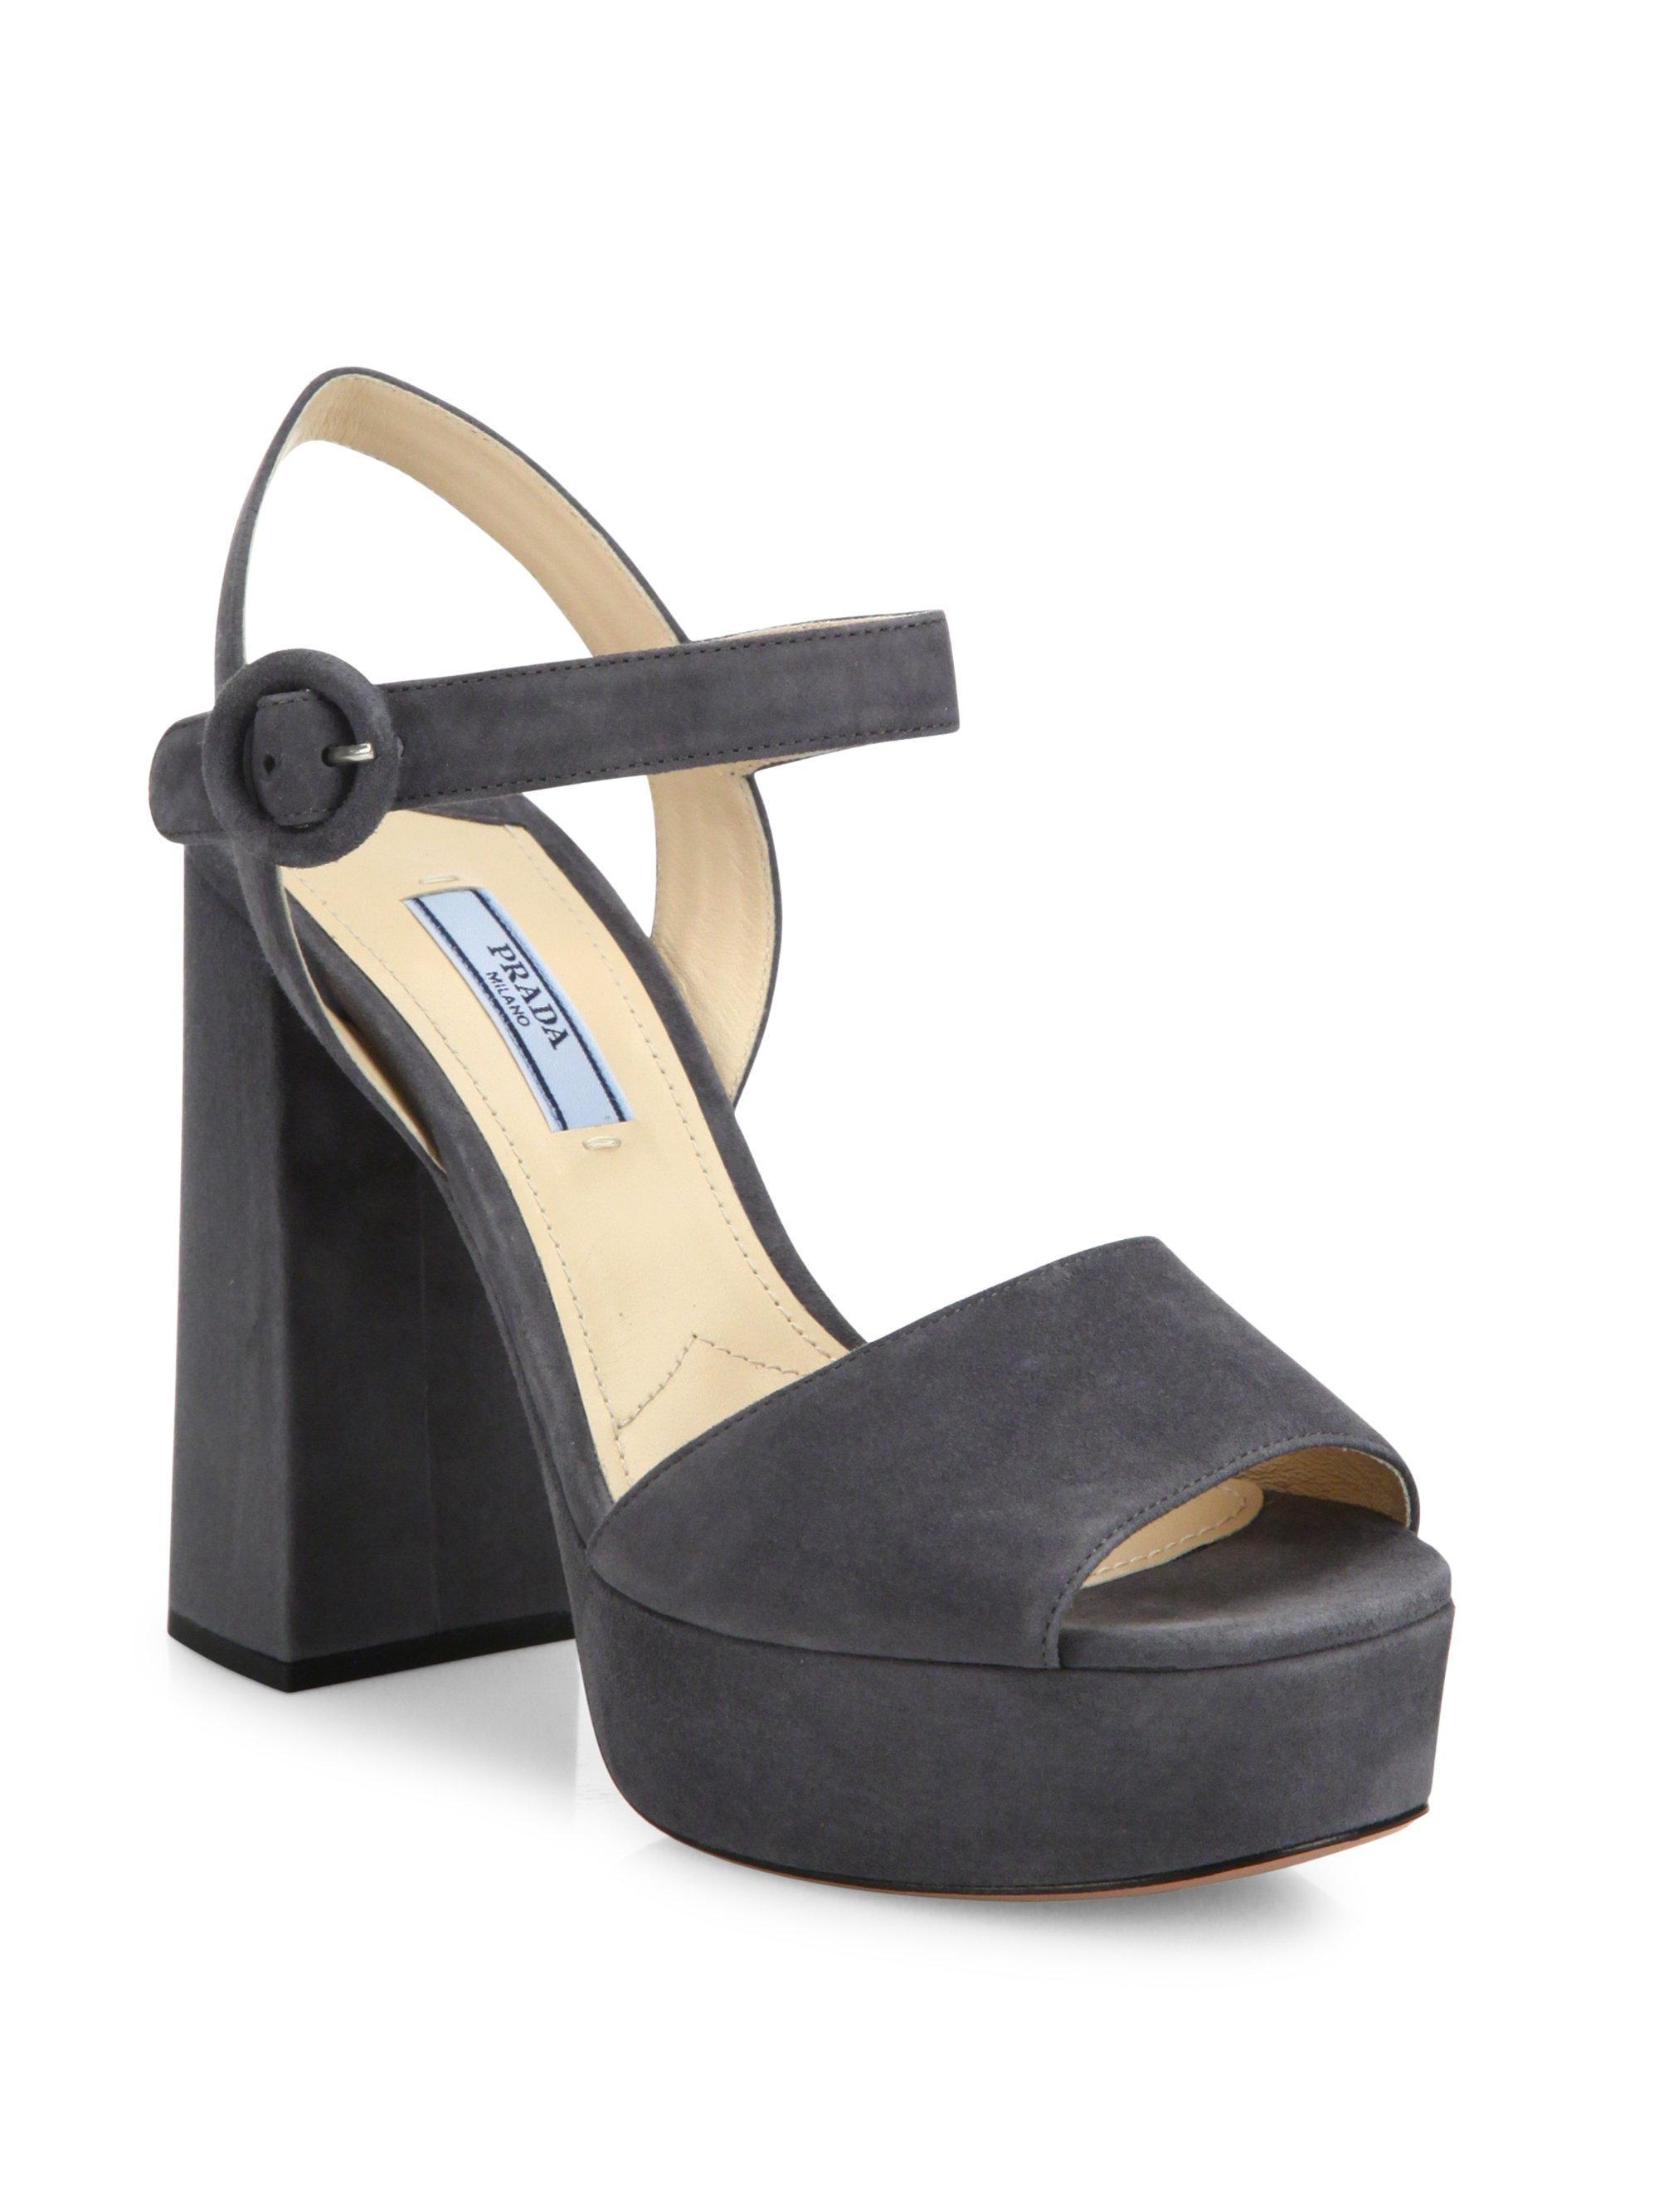 65e2b5230143 Lyst - Prada Suede Peep Toe Platform Sandals in Black